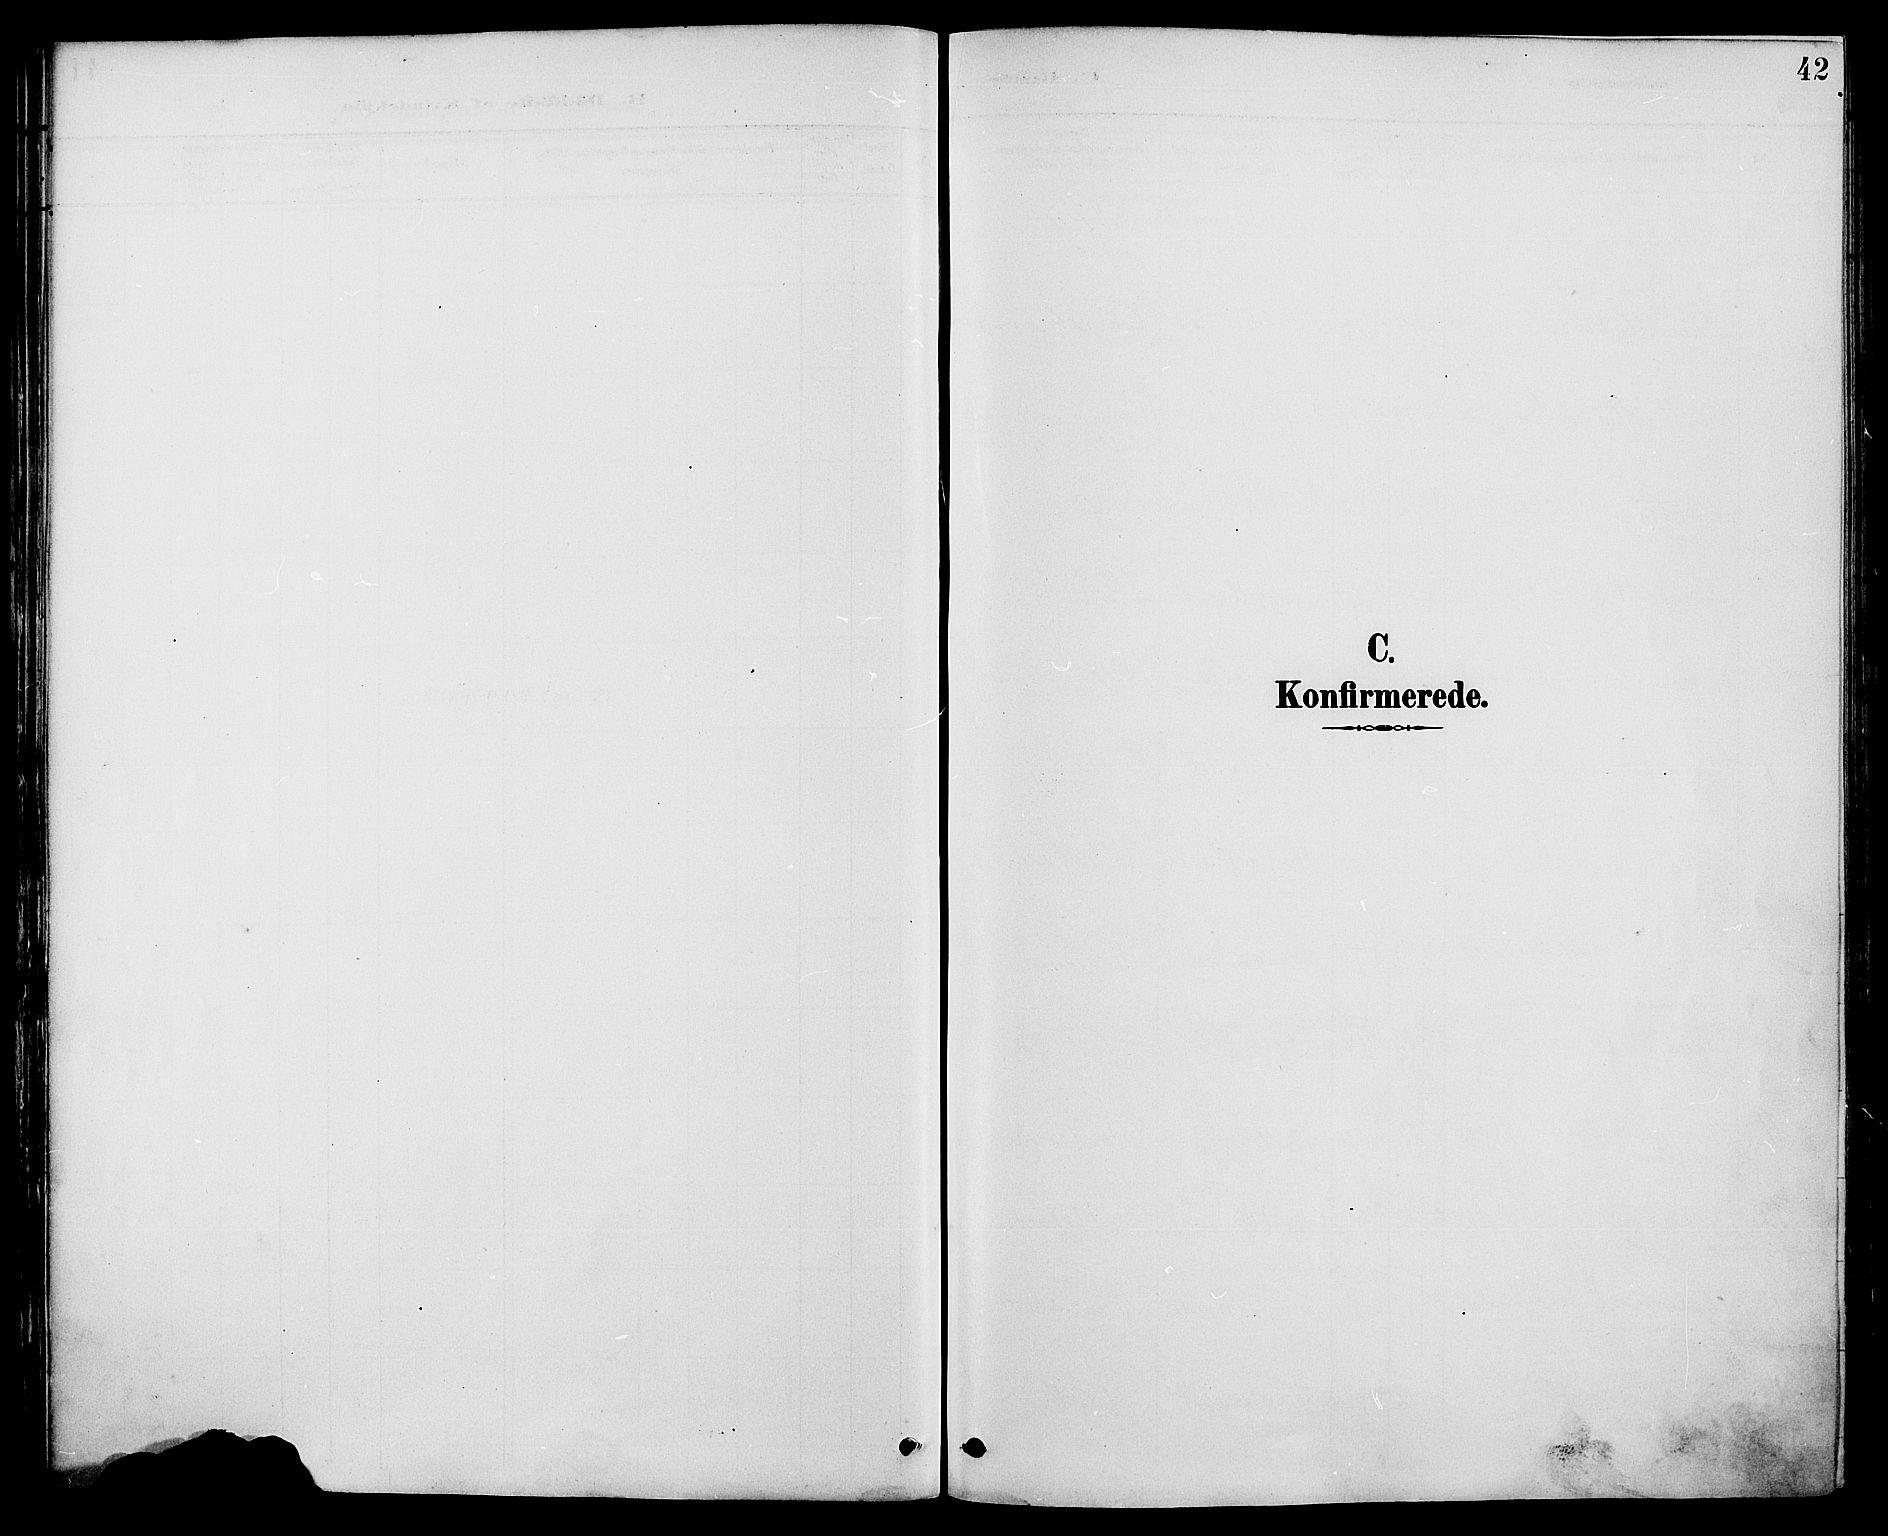 SAH, Biri prestekontor, Ministerialbok nr. 7, 1887-1893, s. 42